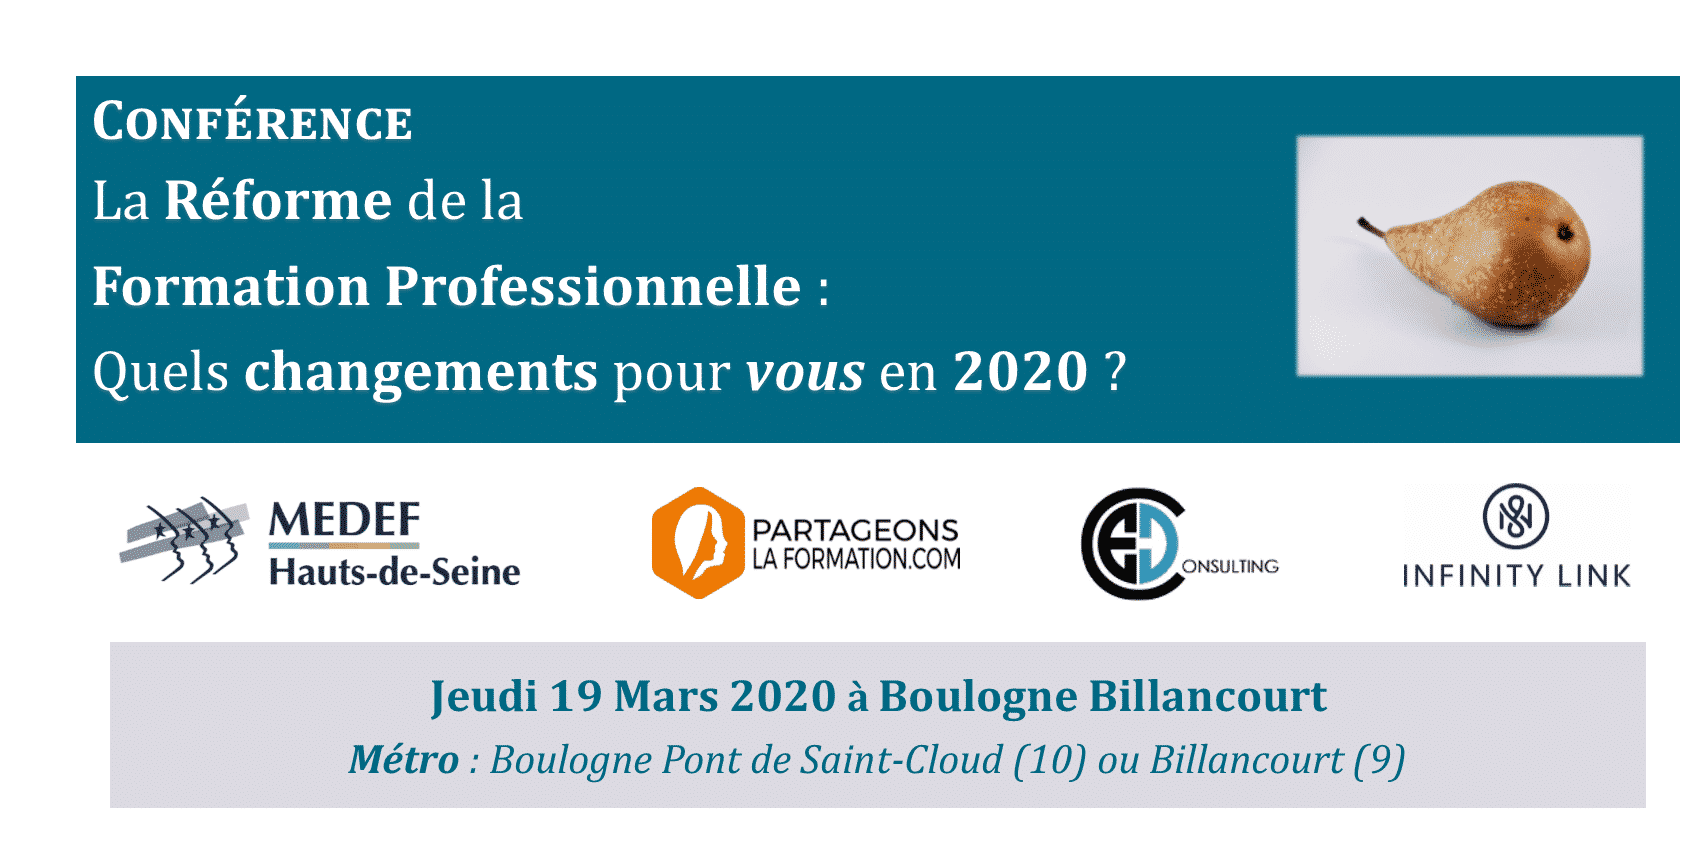 INVITATION ÉVÉNEMENT                                      MARS 2020